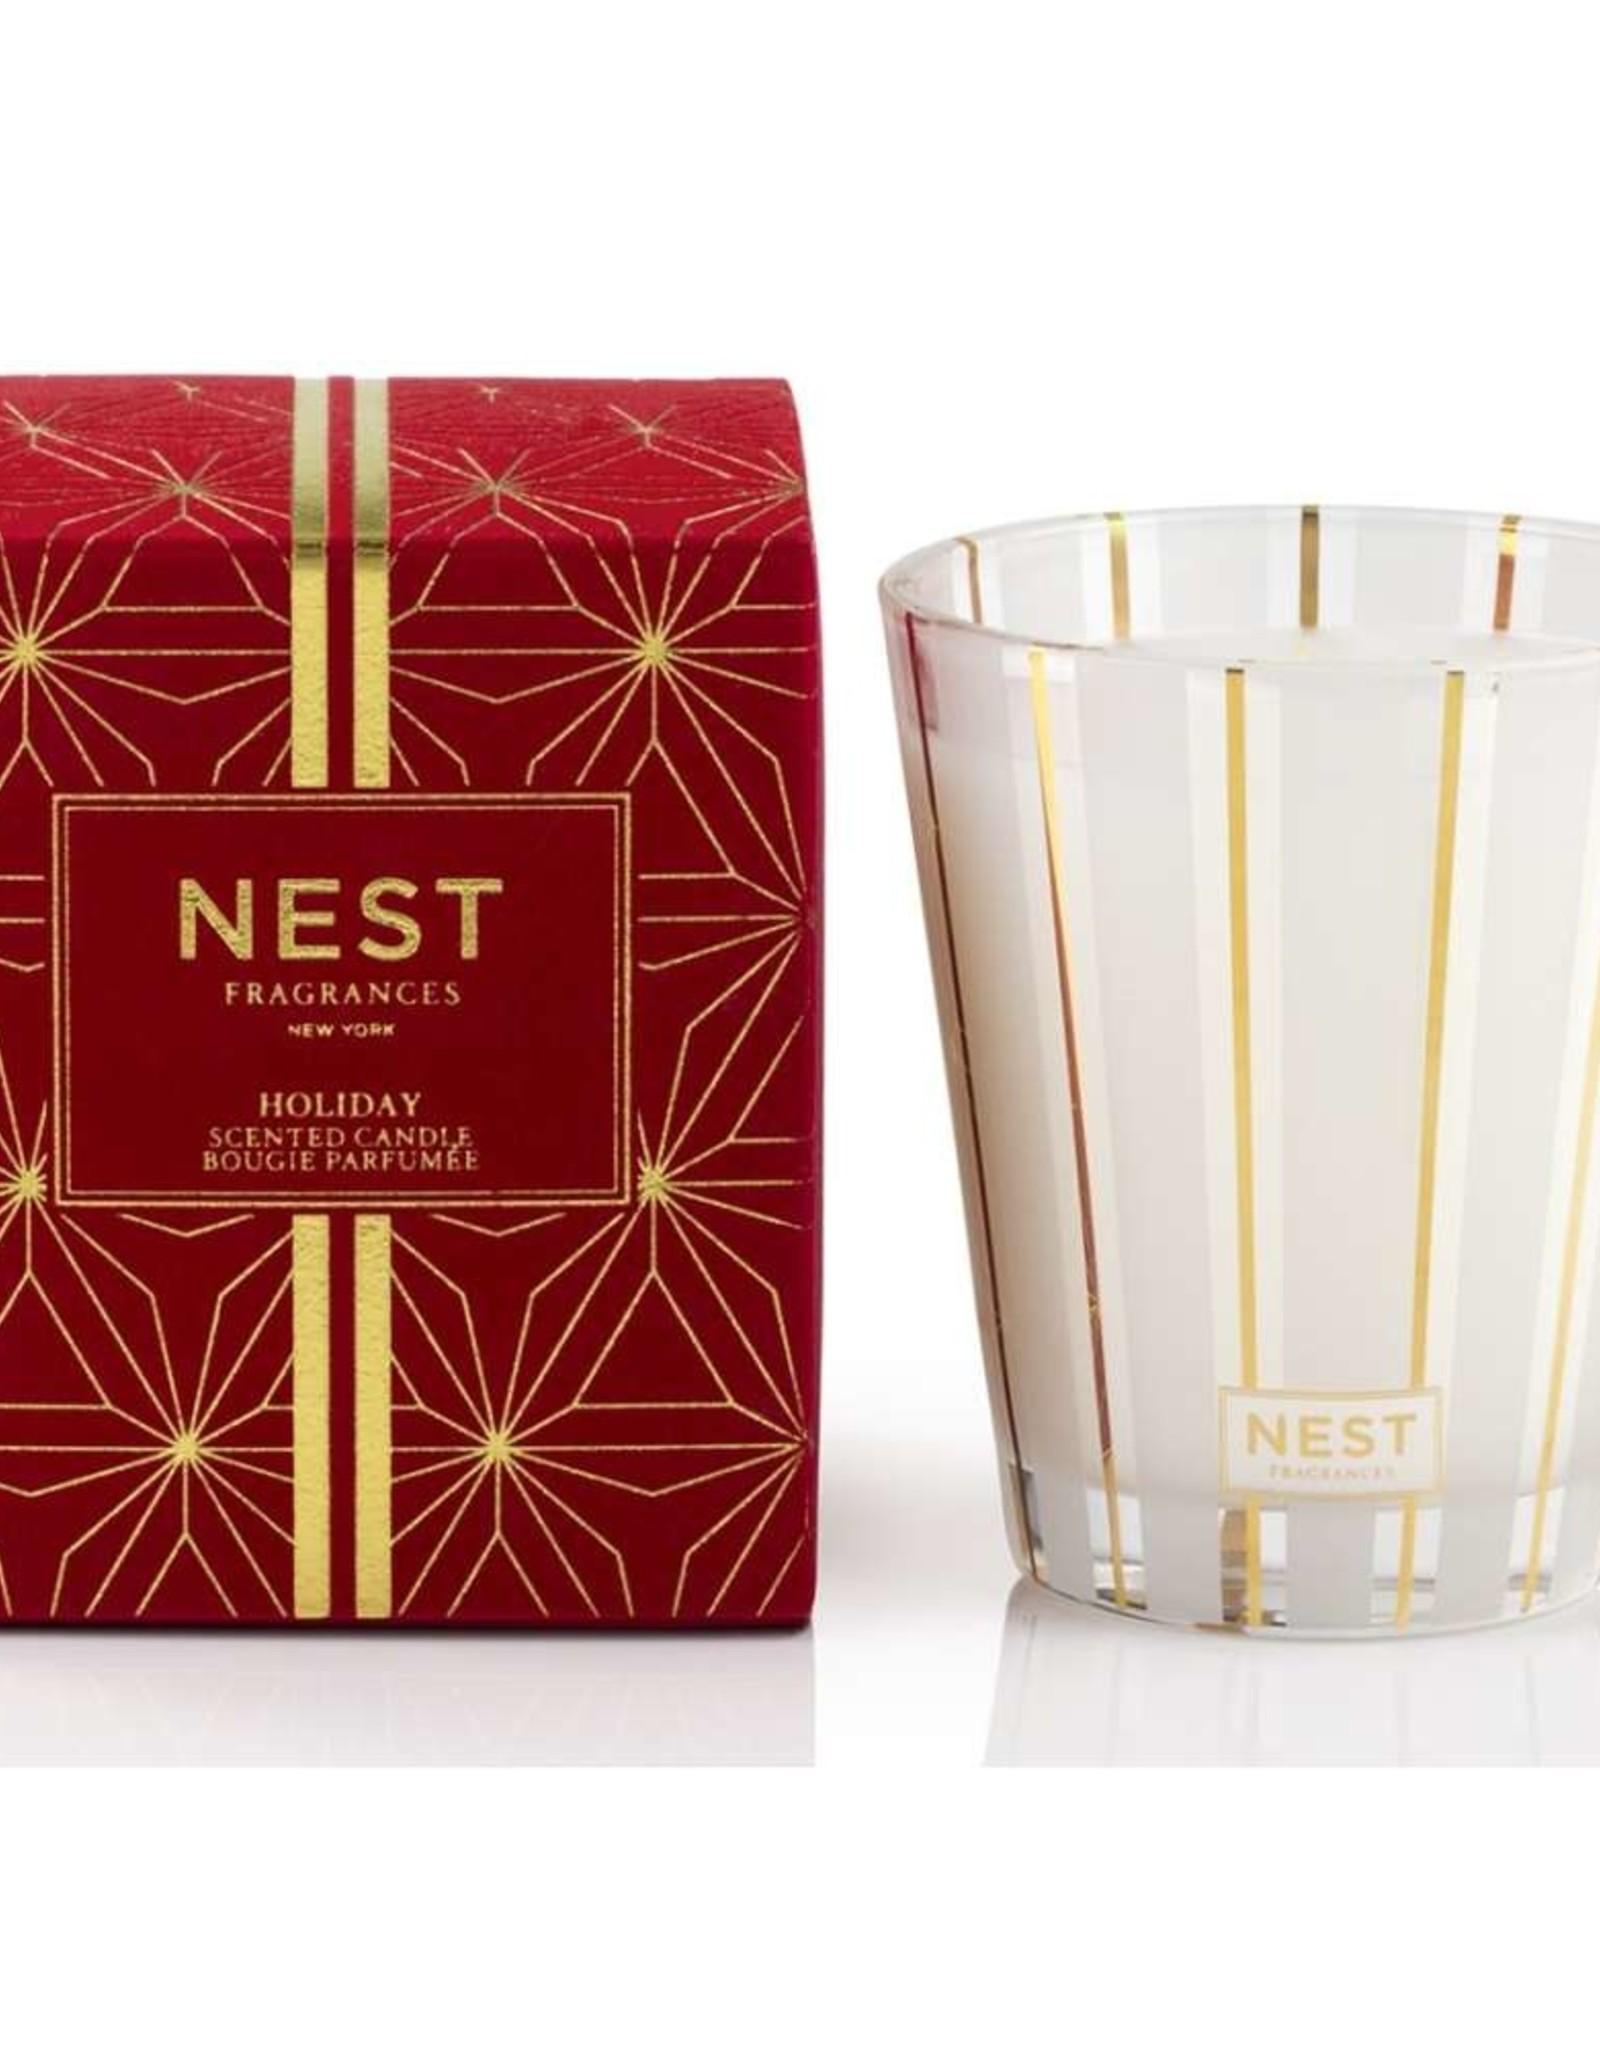 NF-NY Holiday Candle 8.1oz